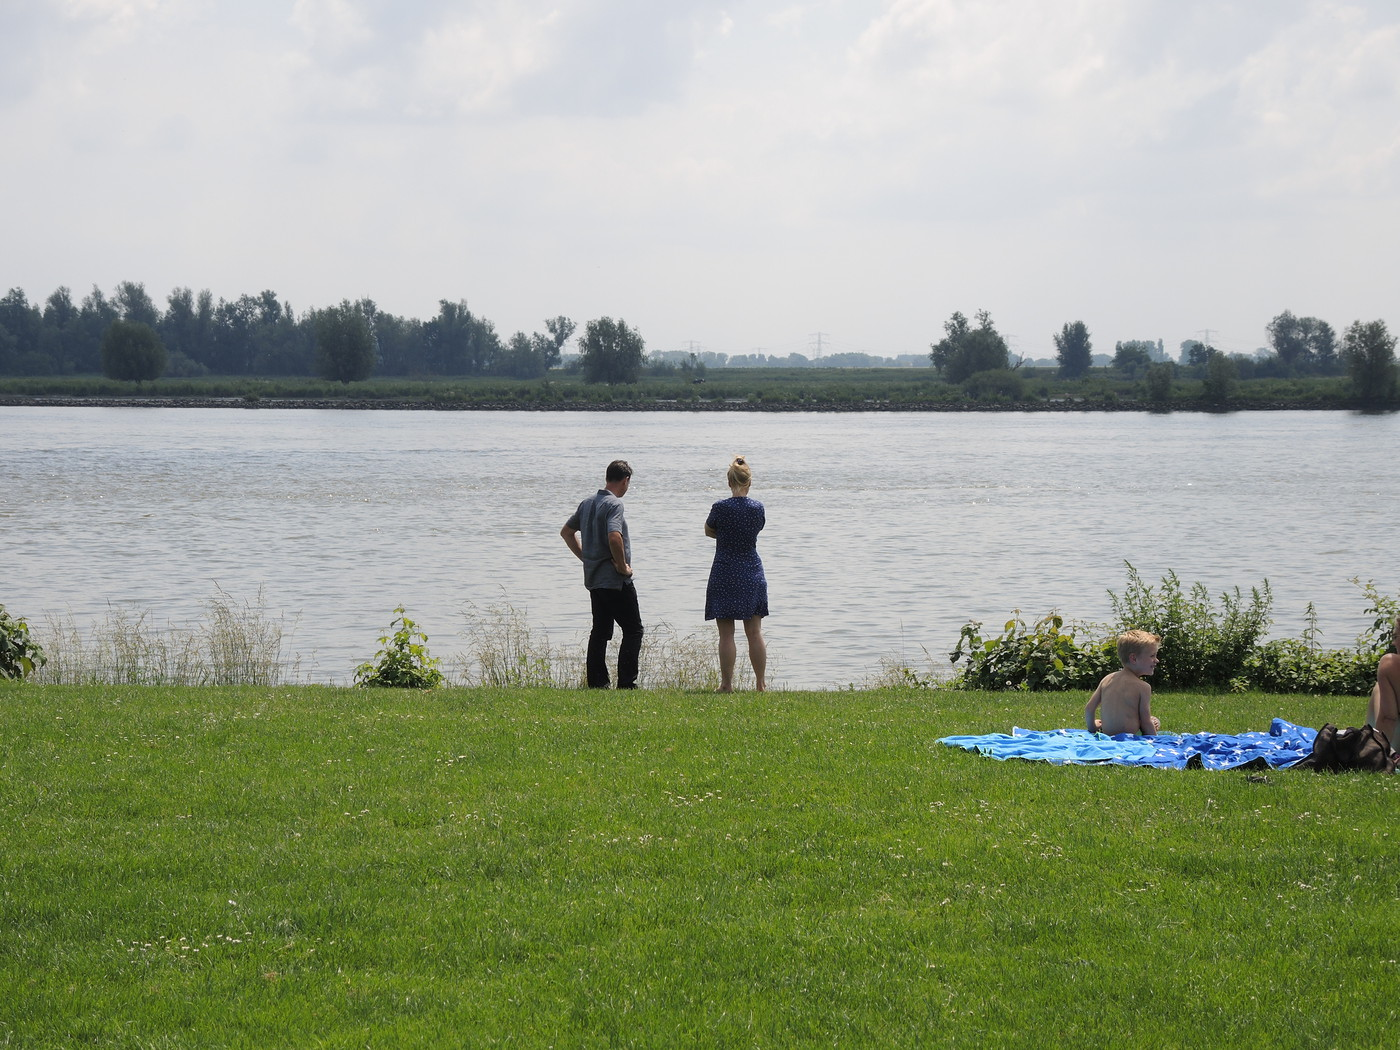 2018-06-03-134656_NLD_Heerjansdam_Barendrechtse Veer.JPG